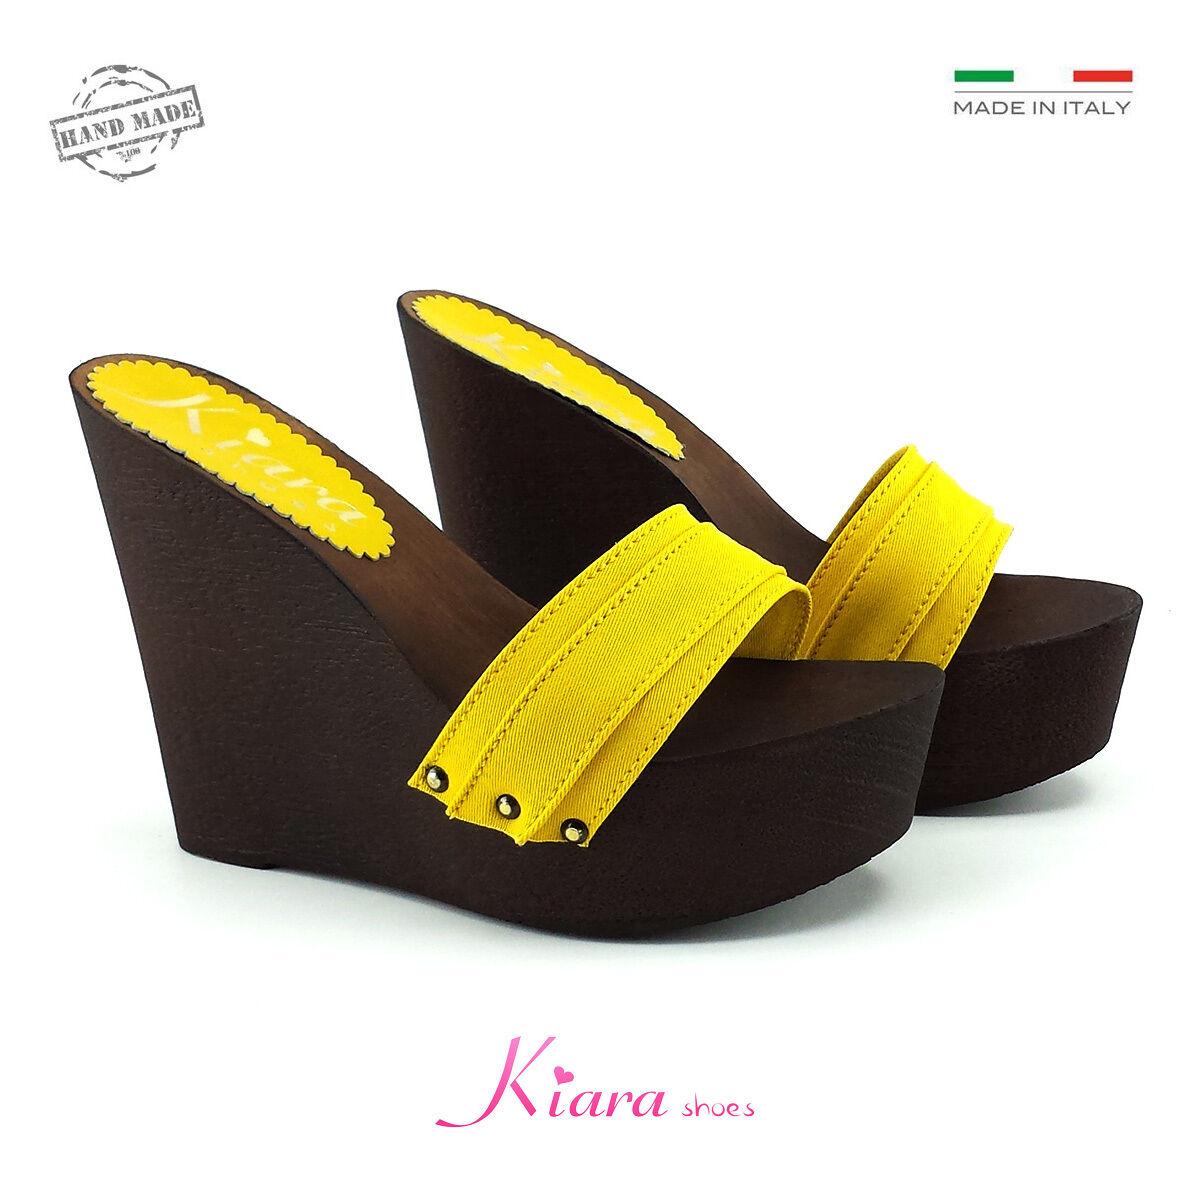 Zeppe Zatteroni Zoccoli Giallo - Schuhe Made in  N. da 35 a 41 - Tacco 13